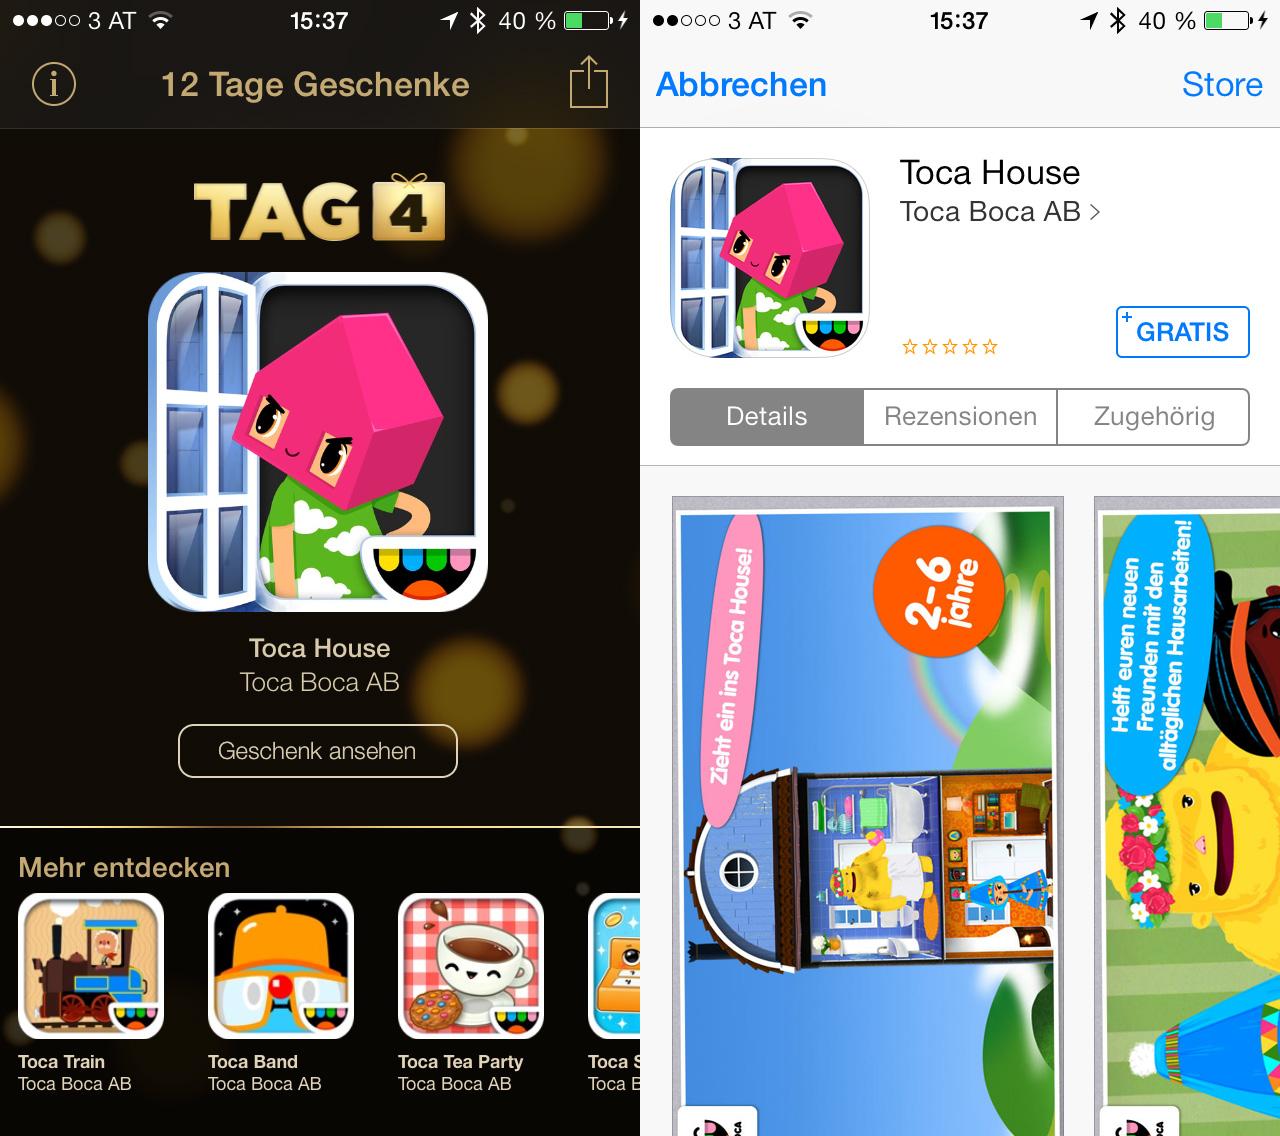 iTunes 12 Tage Geschenke App: Tag 04 - Toca House, App, Spiel, kostenlos, download, review, Hack4Life, Fabian Geissler